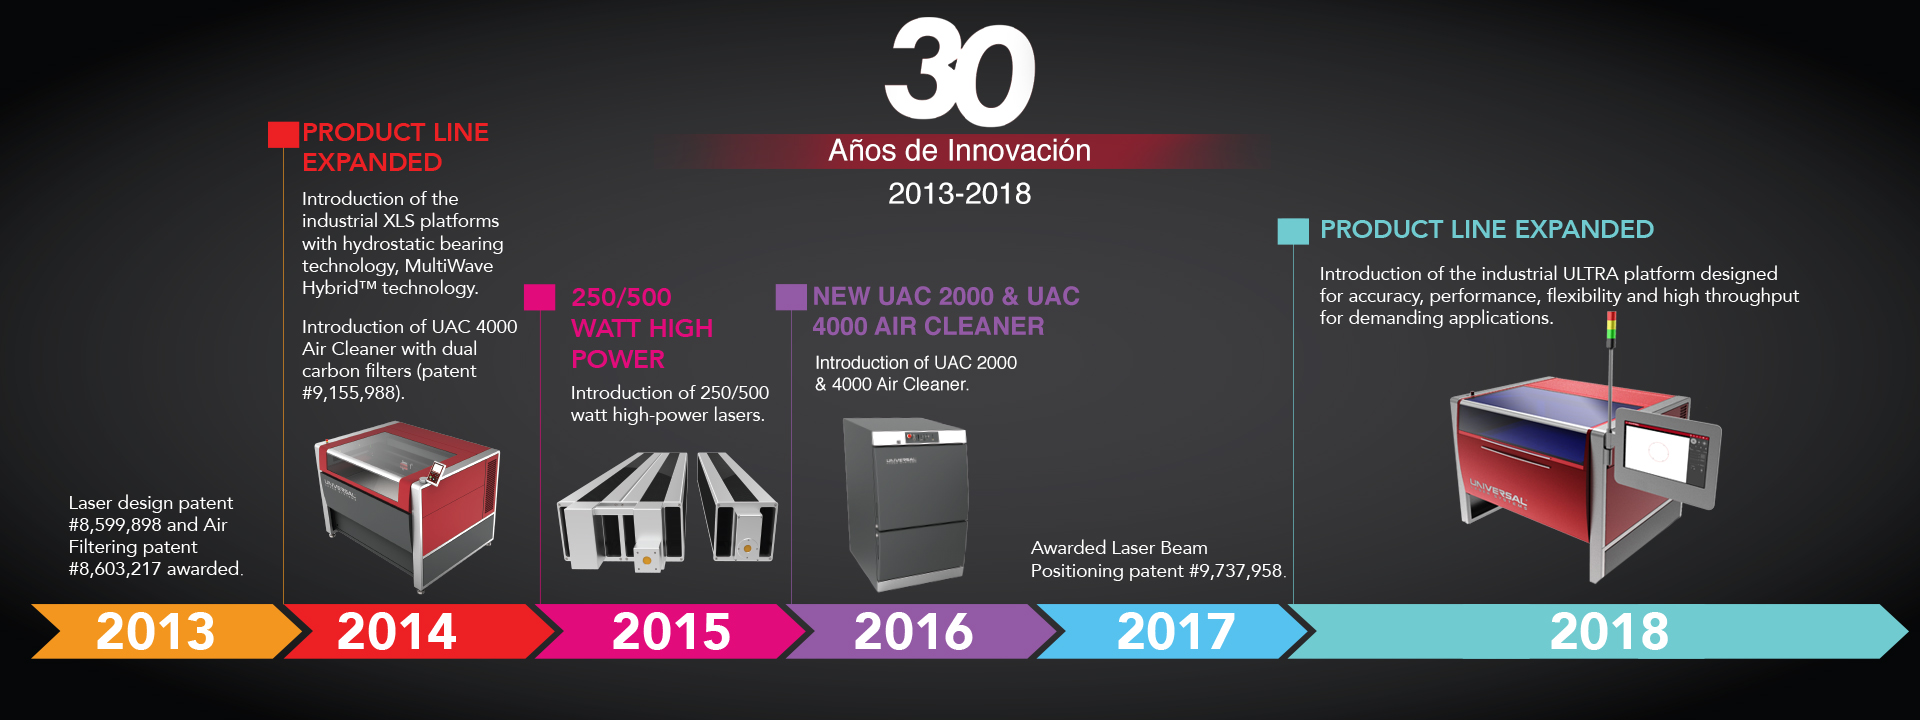 ULS Spanish Timeline 4